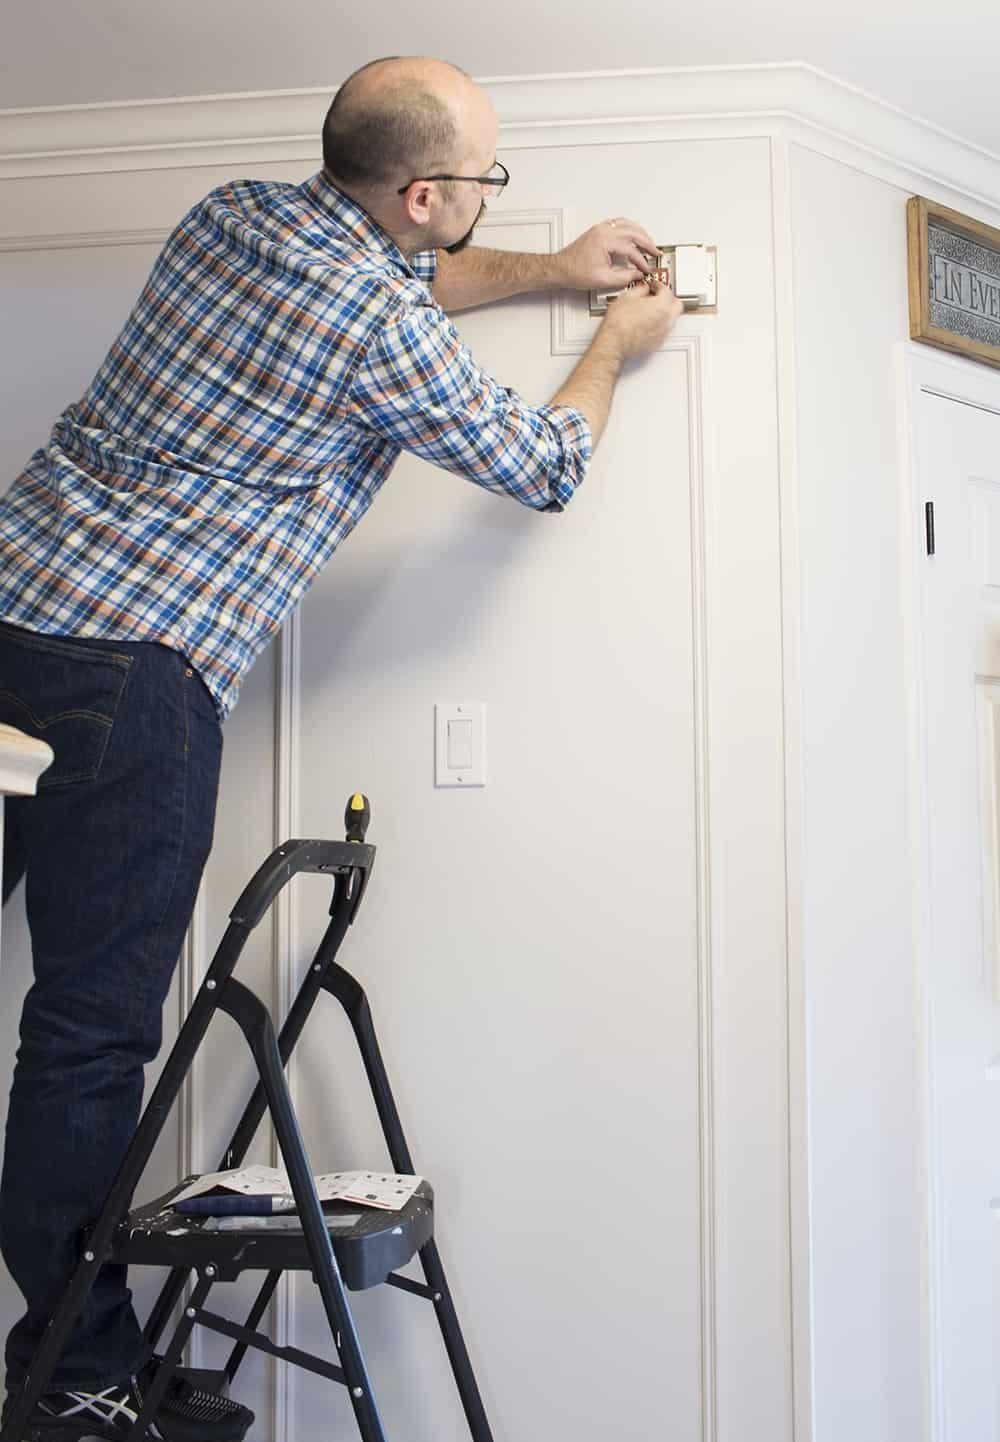 Two Doorbell Chimes On Vintage Nutone Chime Doorbell Wiring Diagrams